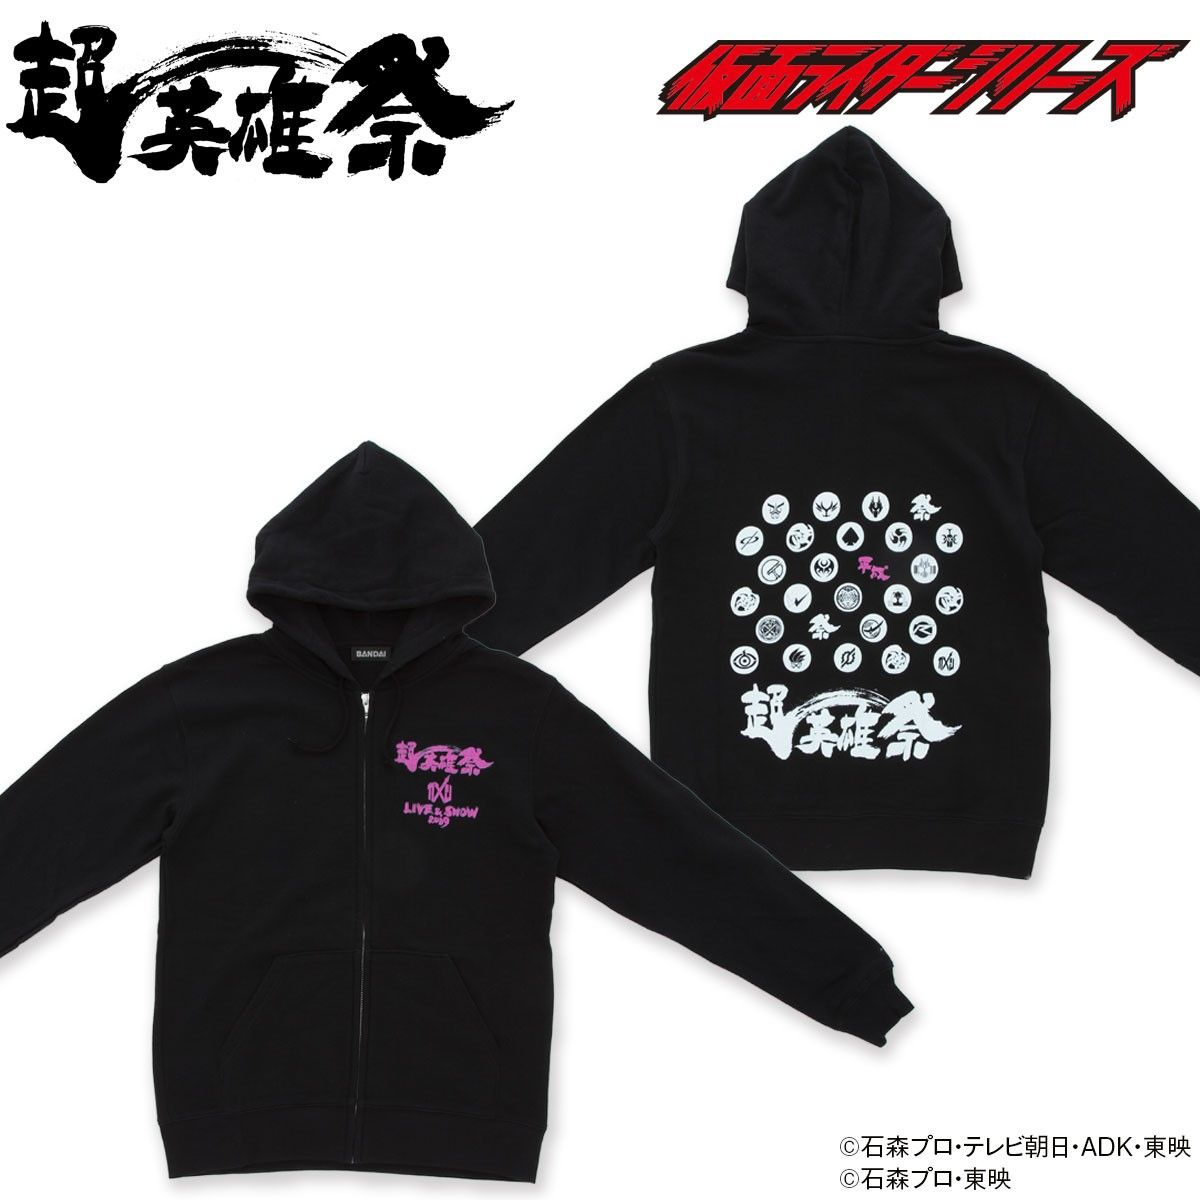 Super Hero Festival 2019 HEISEI KAMEN RIDER 20 works celebration hoodie